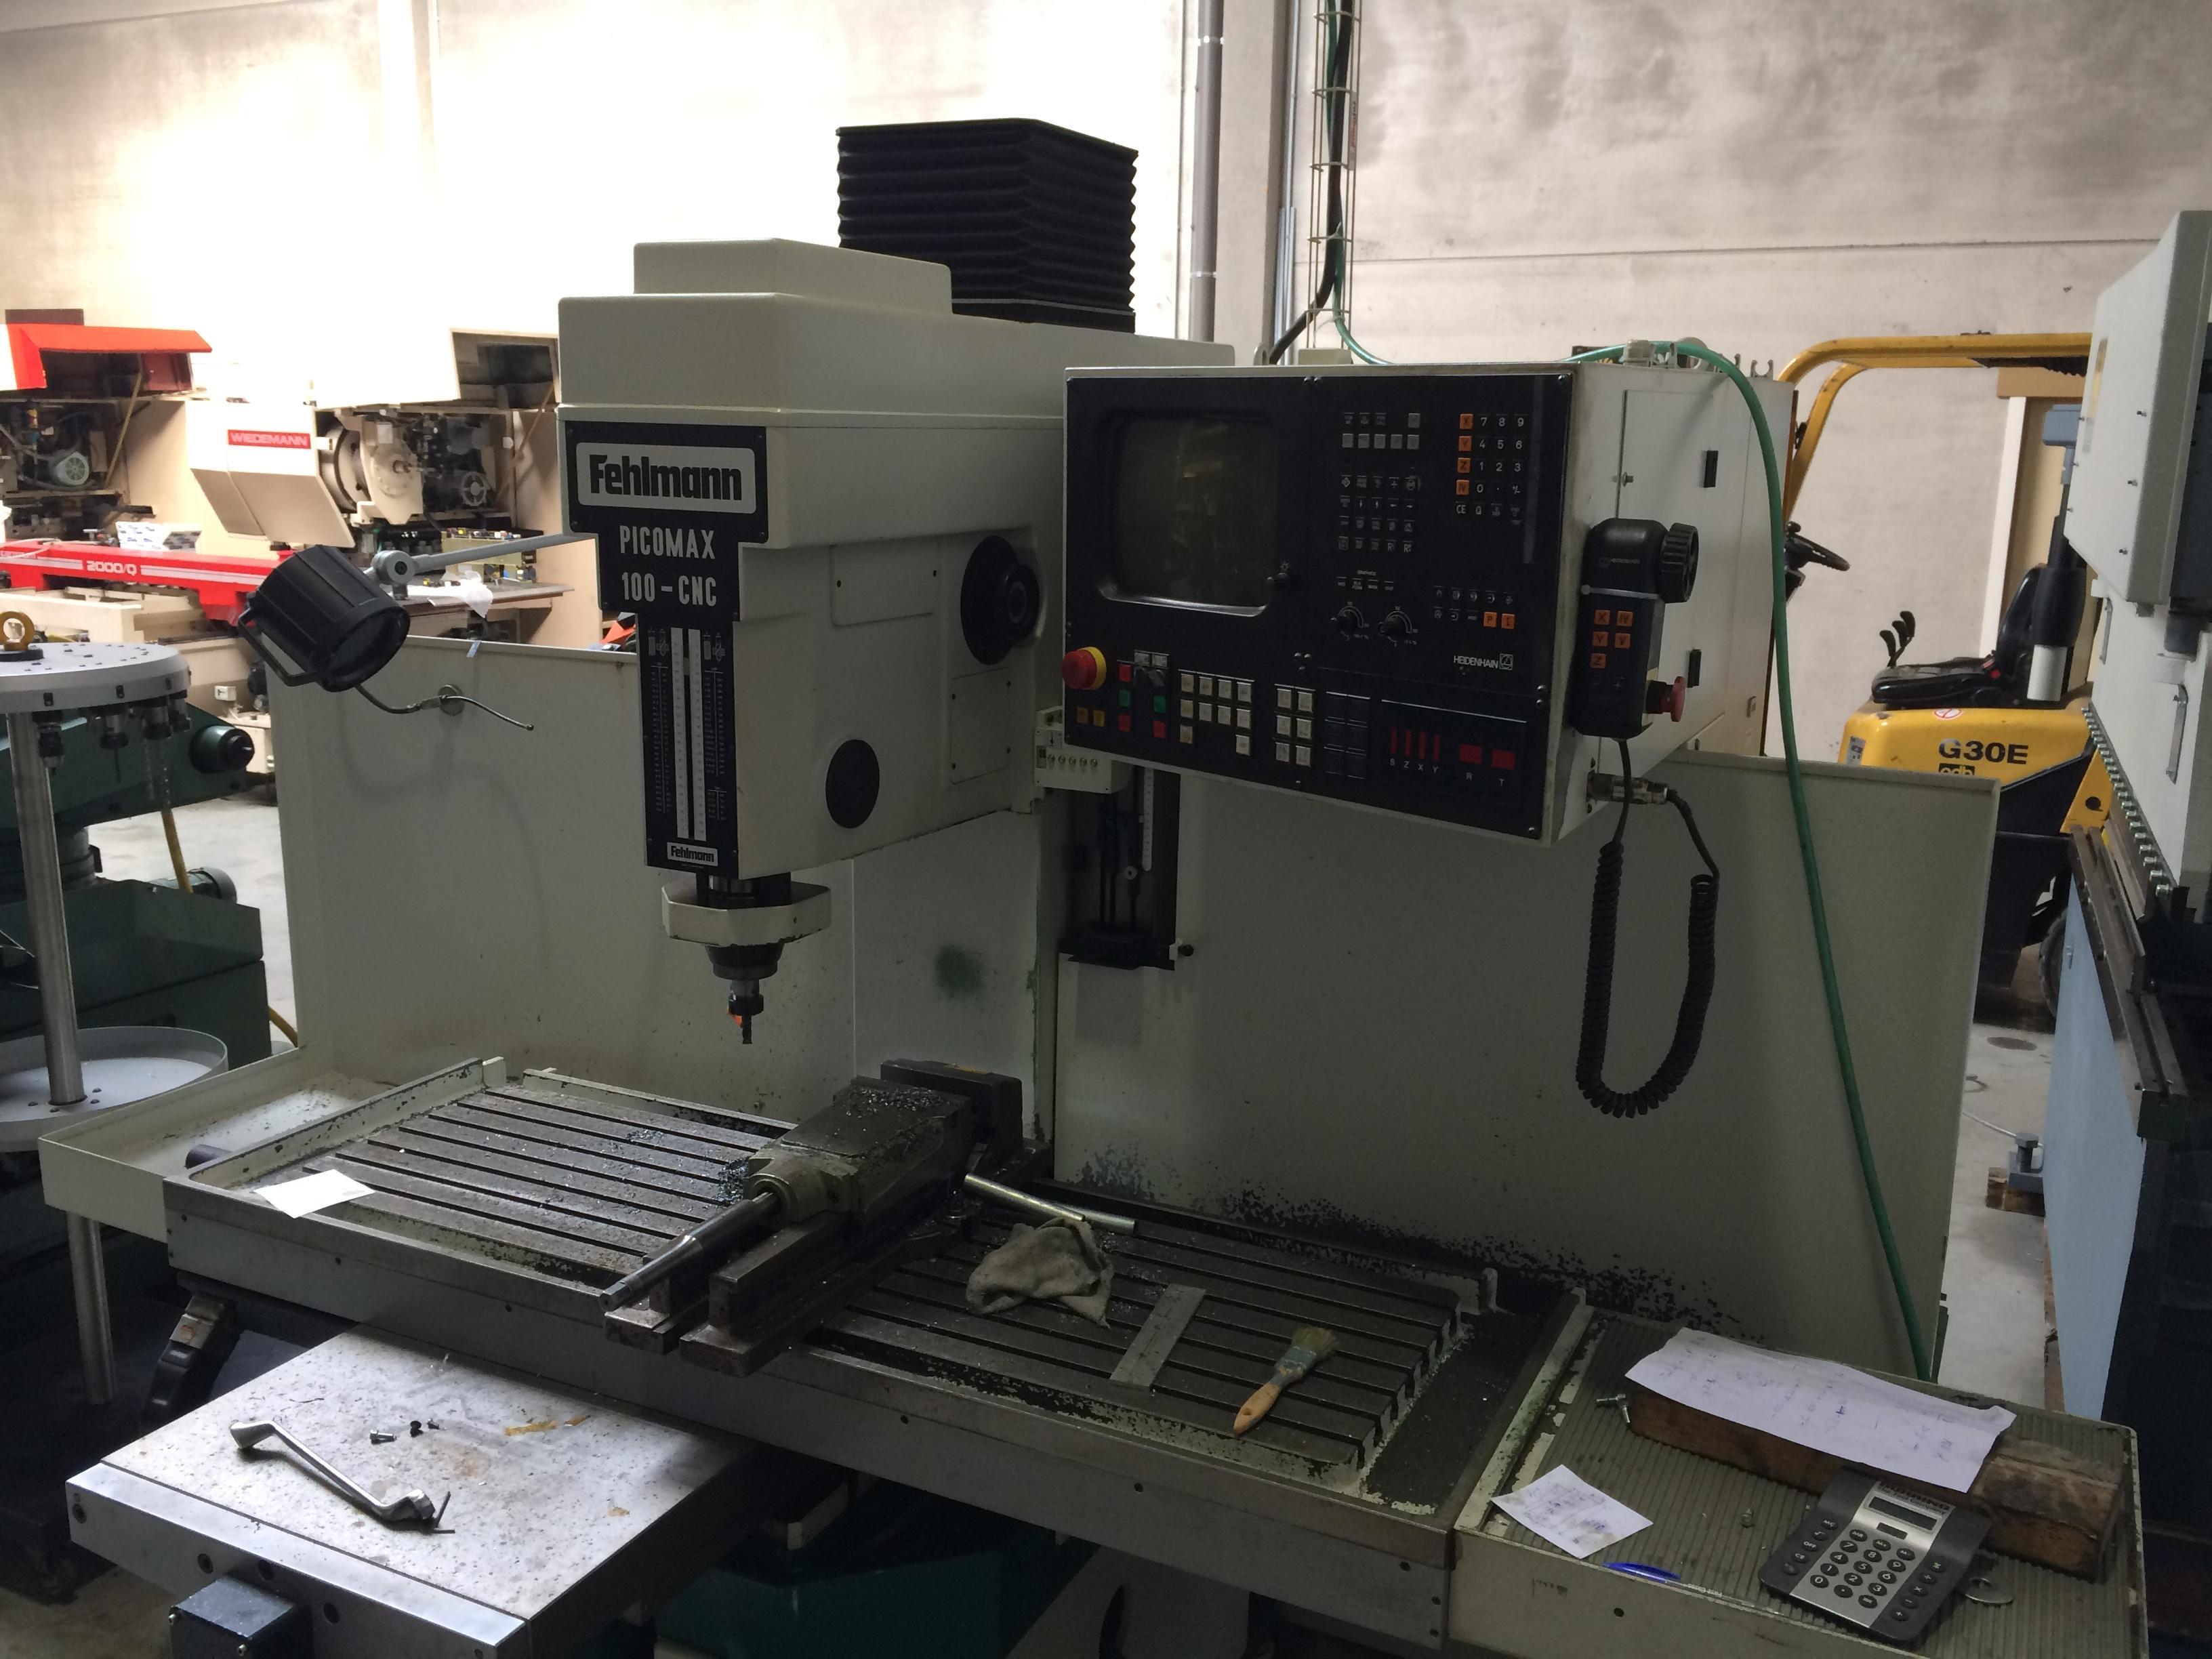 Fehlmann P100 CNC